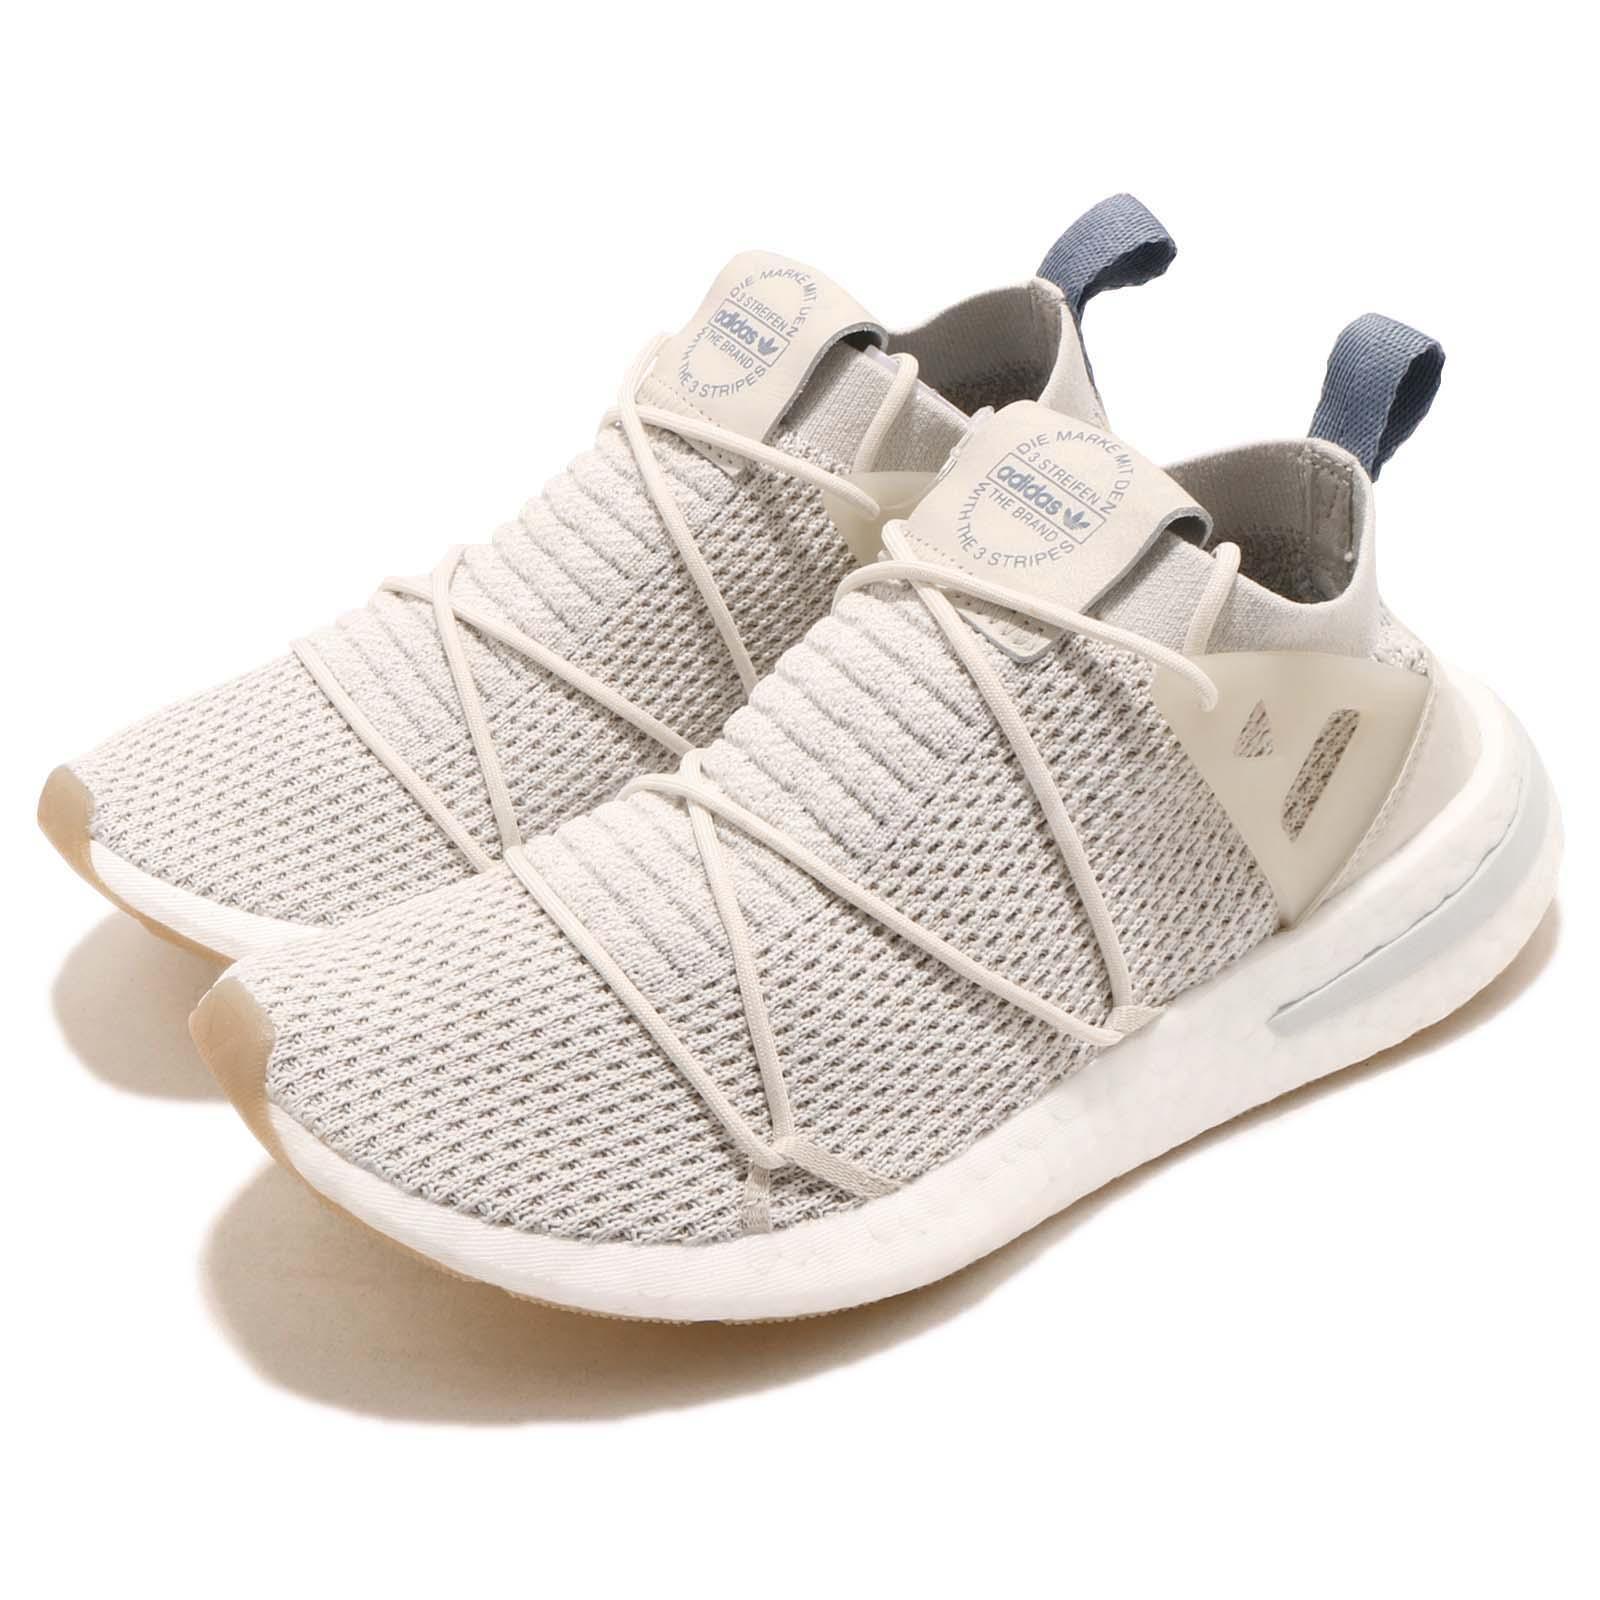 lowest price 97478 beca7 Details about adidas Originals ARKYN PK W Primeknit Boost Talc Linen Women  Running Shoe B96509